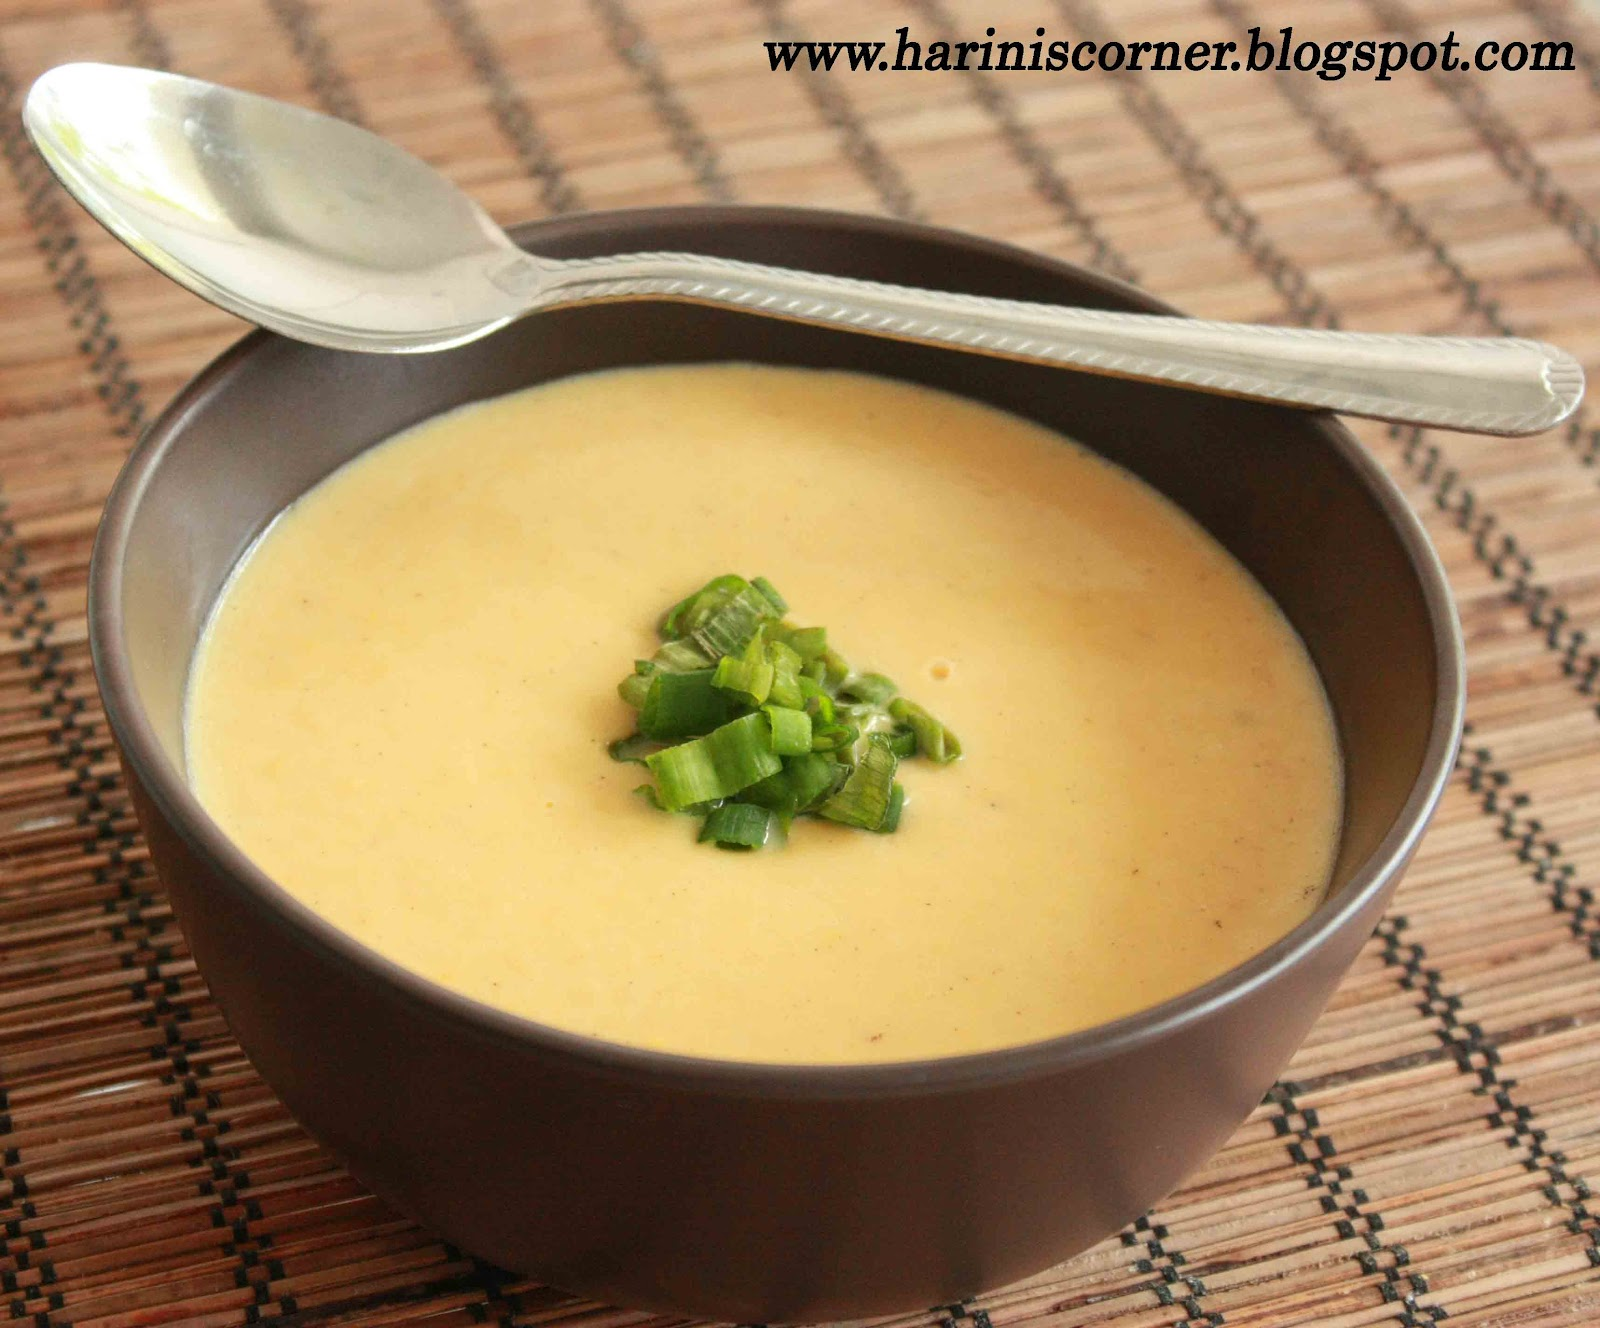 Sugar & Spice: Creamy Sweet Corn Sweet Potato Soup